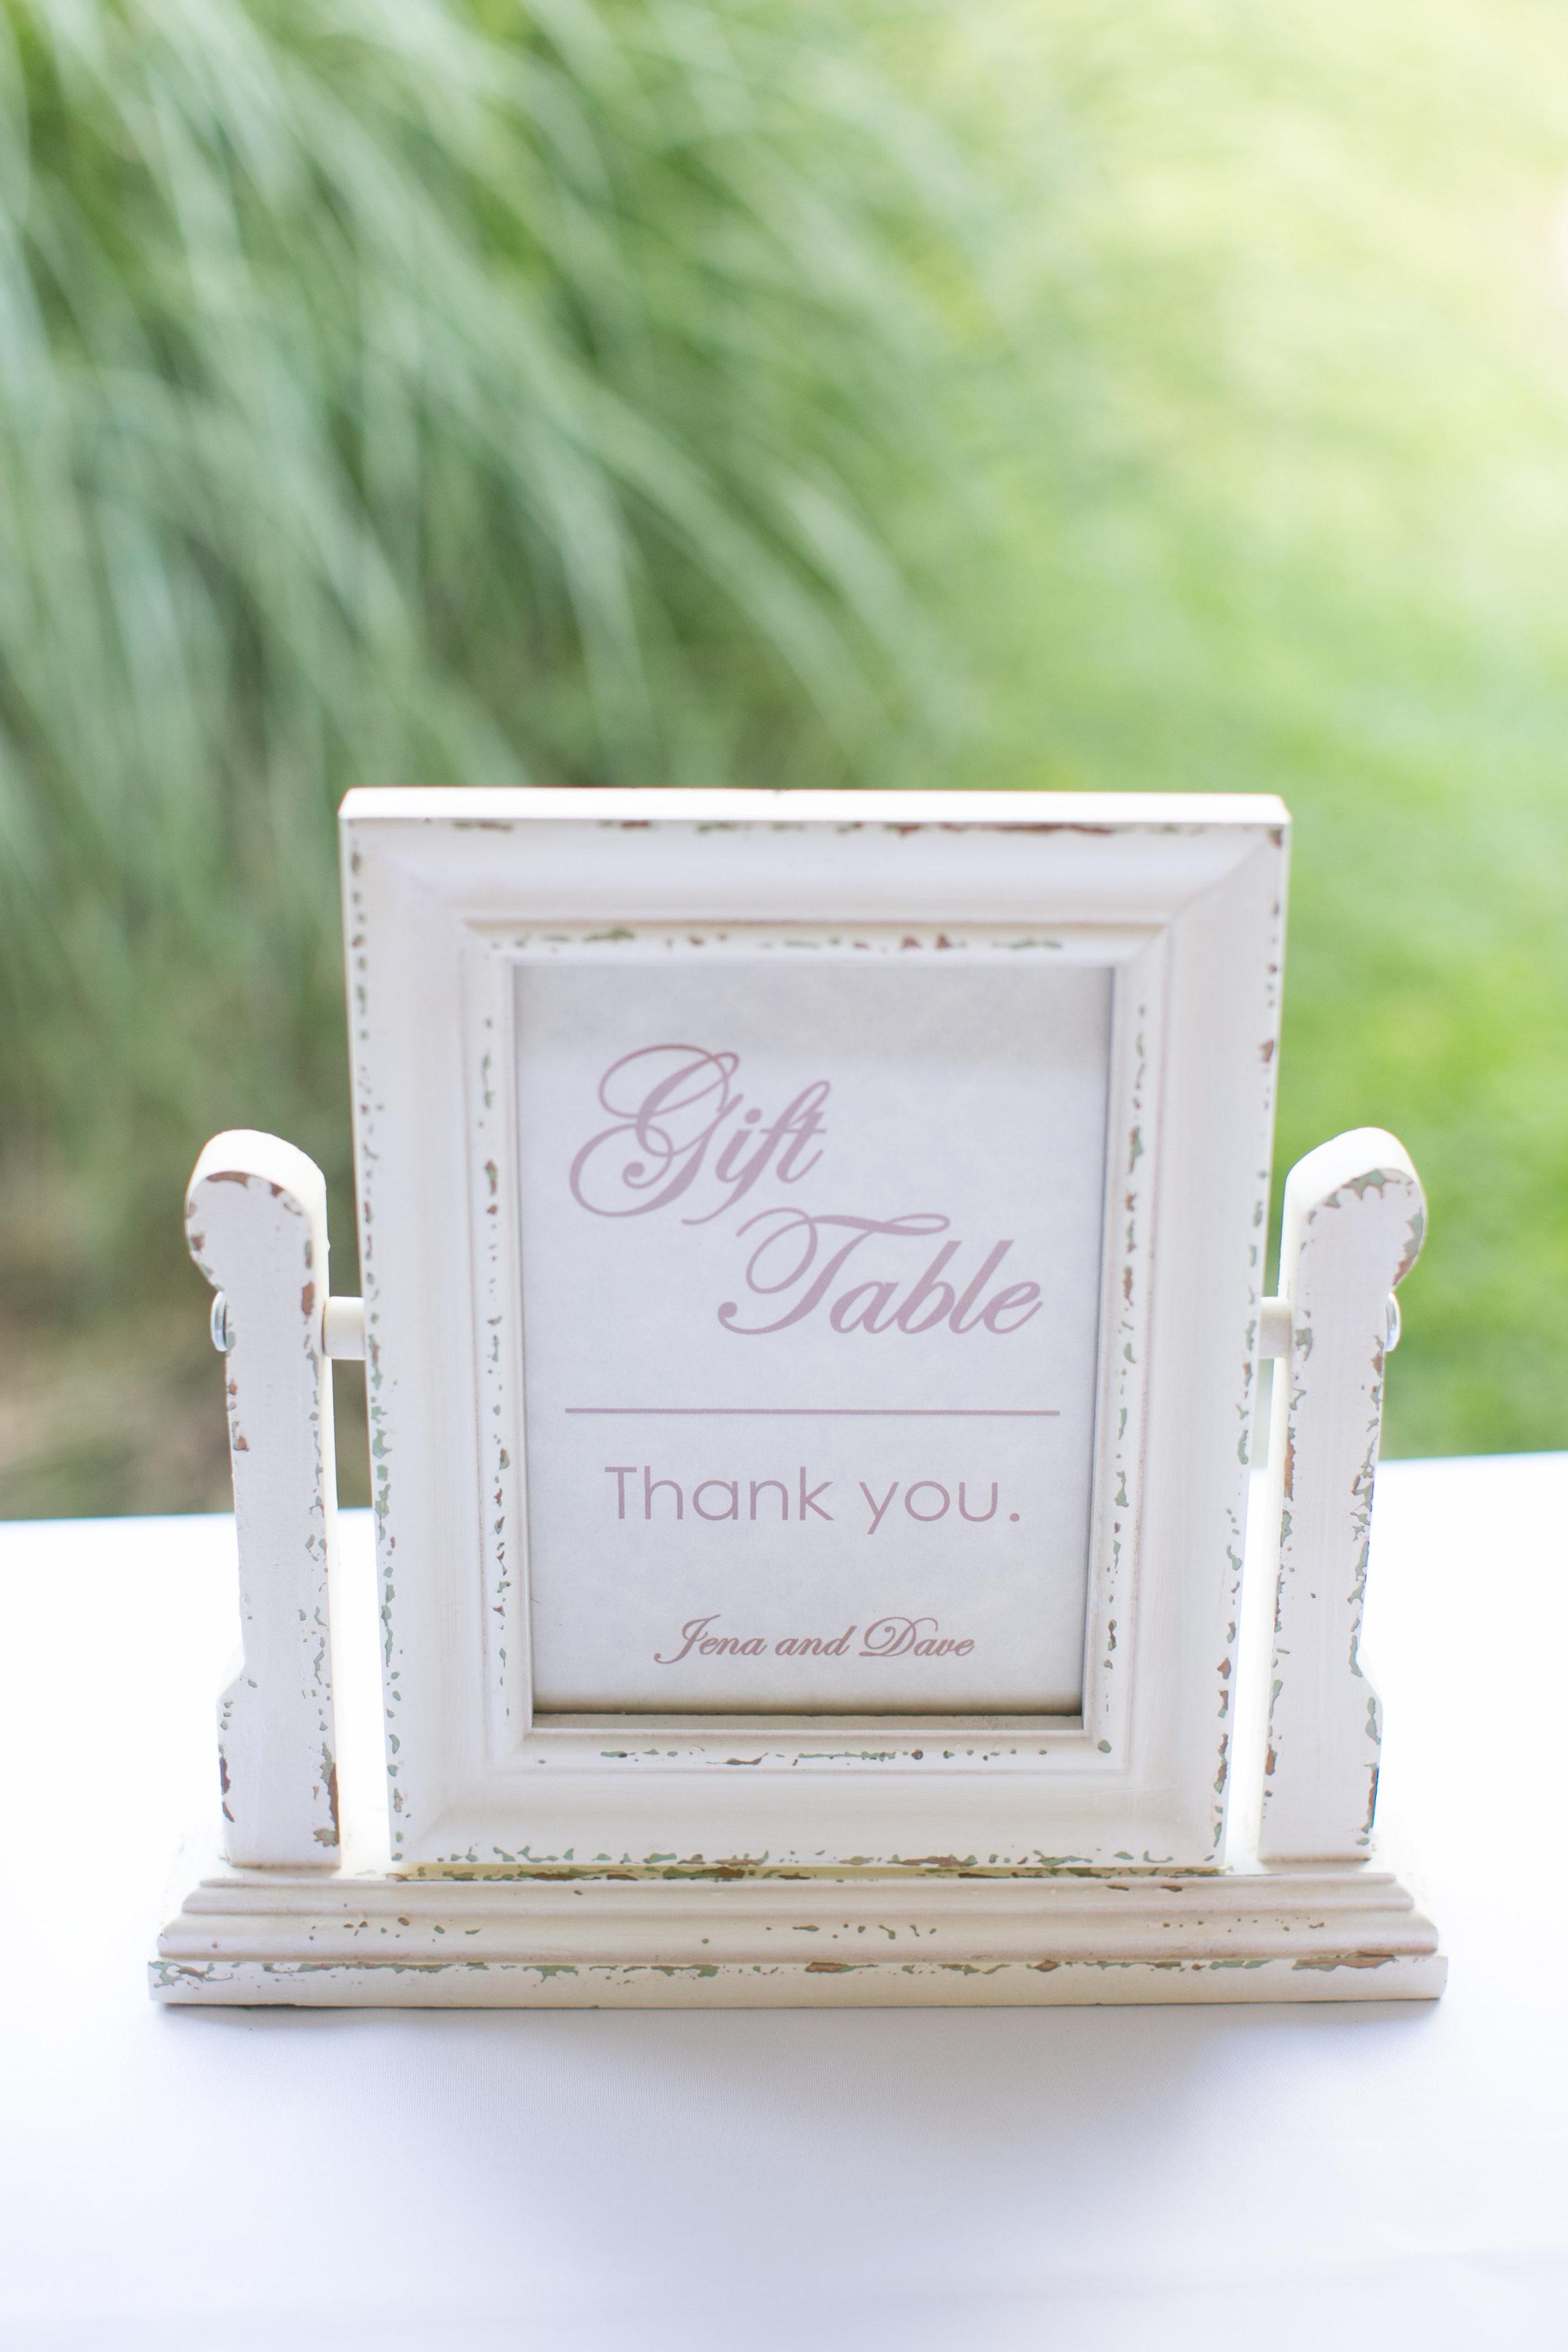 Pure elegance events Tynise Kee dc wedding planner va wedding planner rust manor house leesburg -0051.jpg